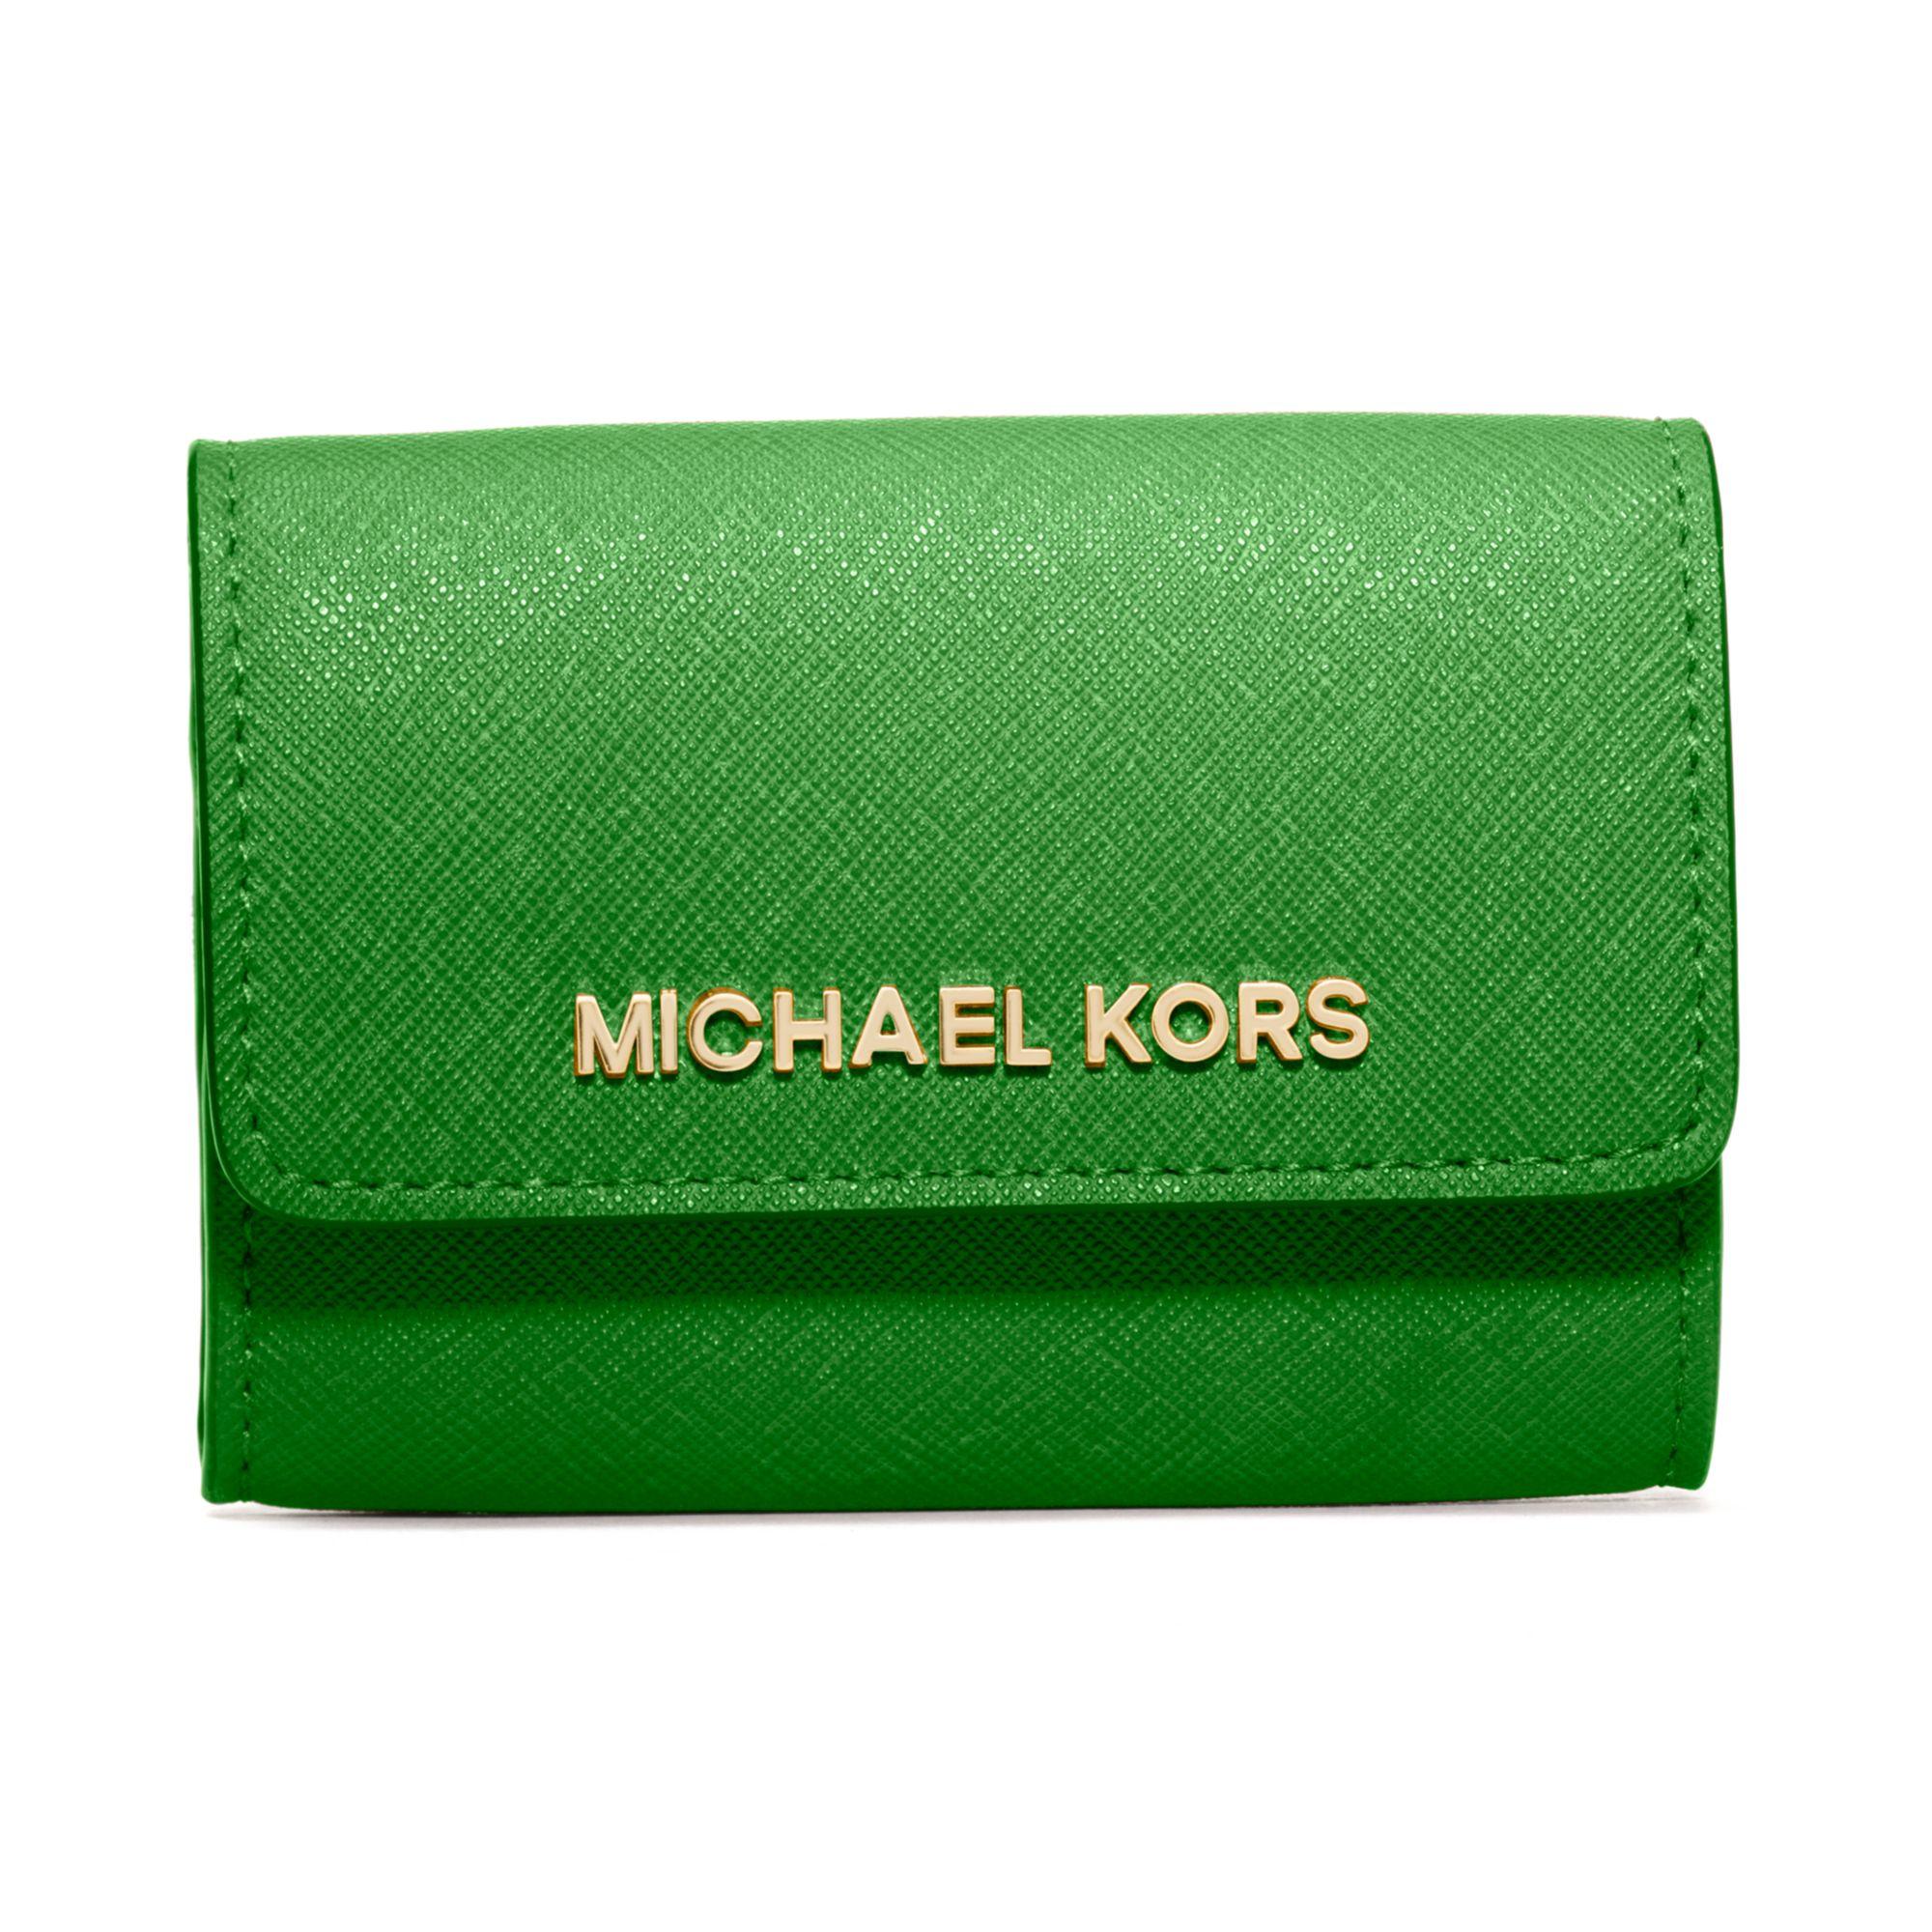 michael kors jet set travel coin purse in green palm lyst. Black Bedroom Furniture Sets. Home Design Ideas